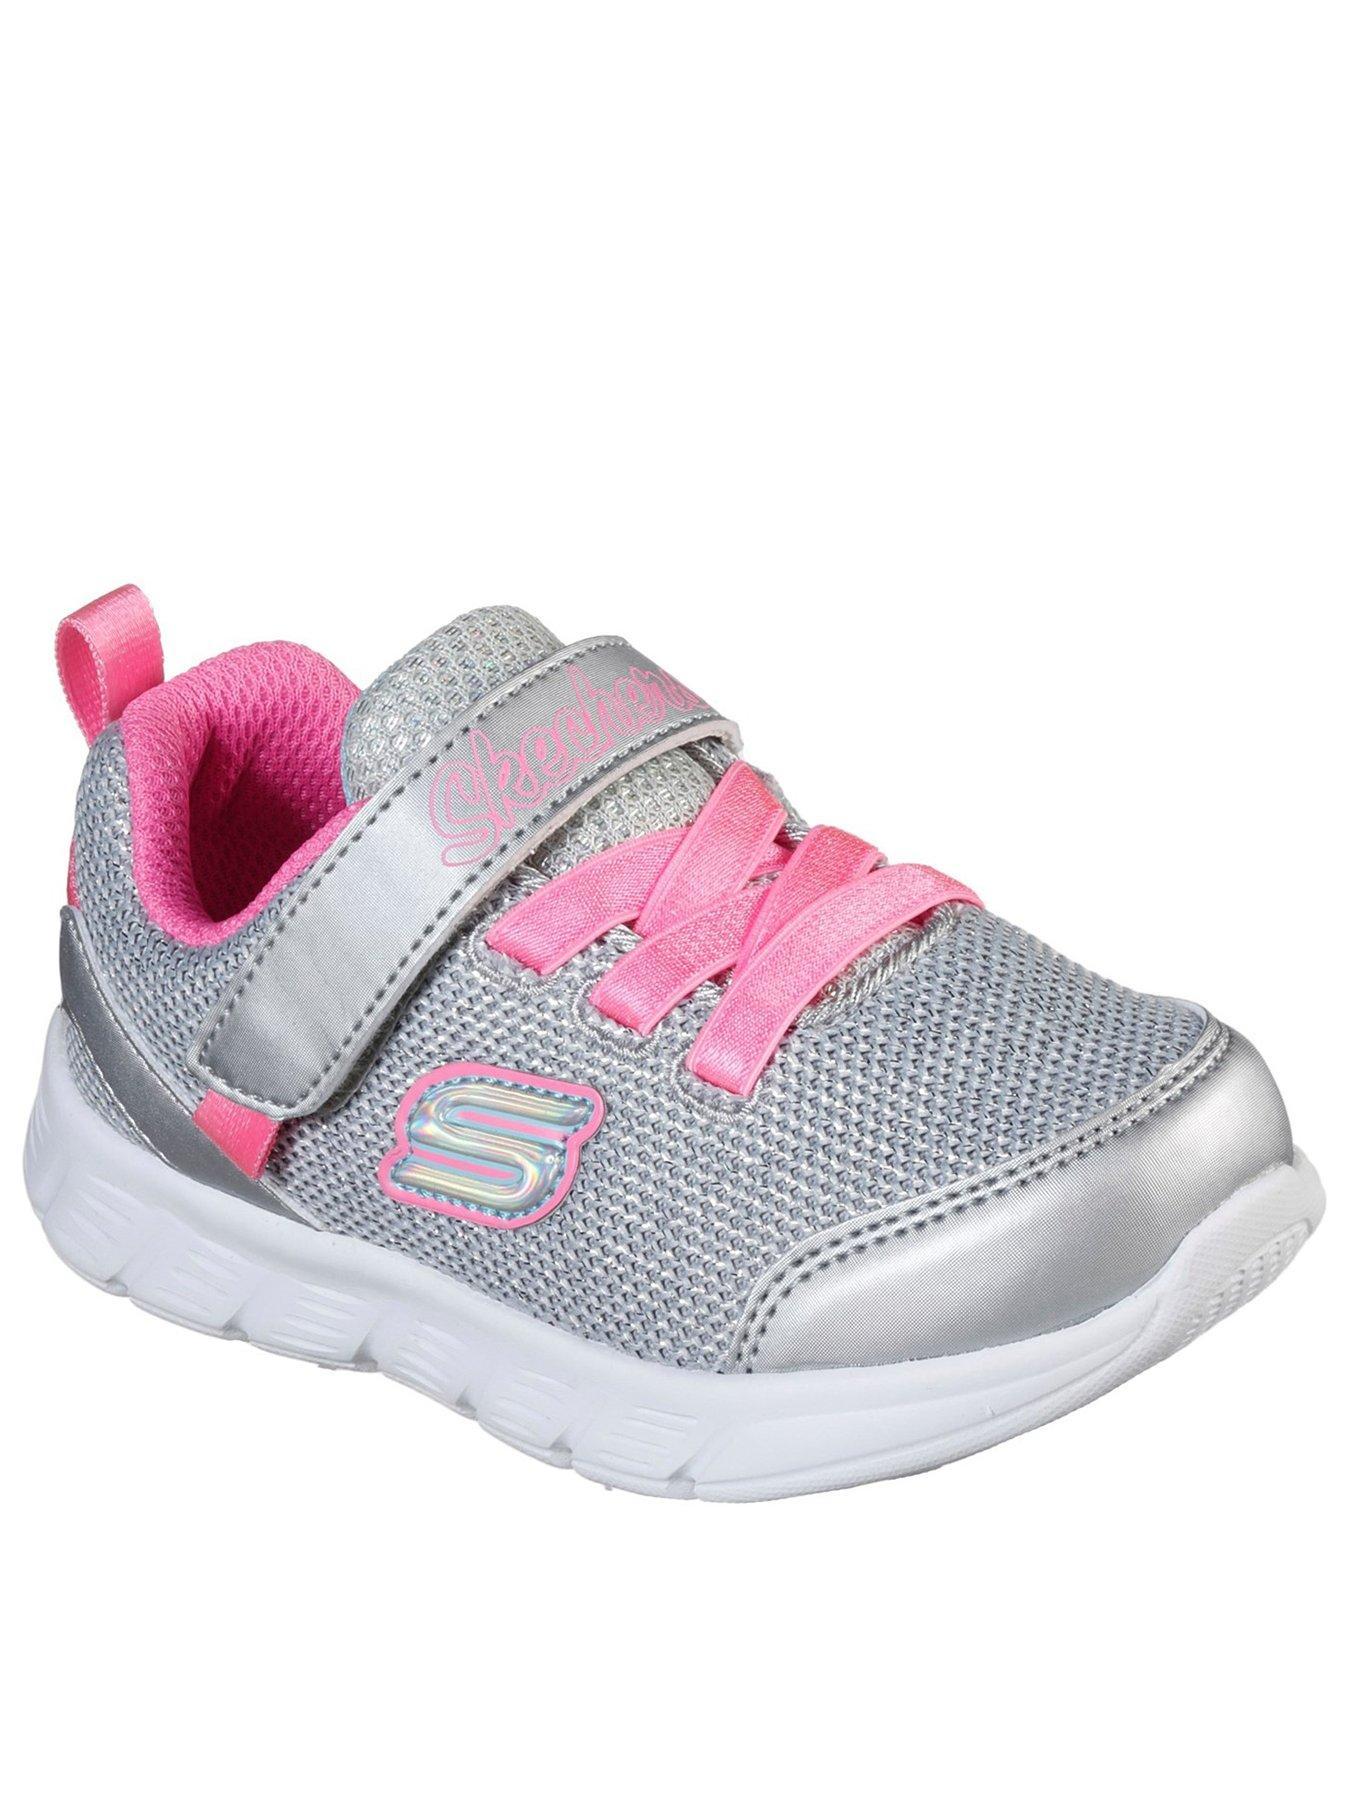 Skechers | Child \u0026 baby | www.very.co.uk